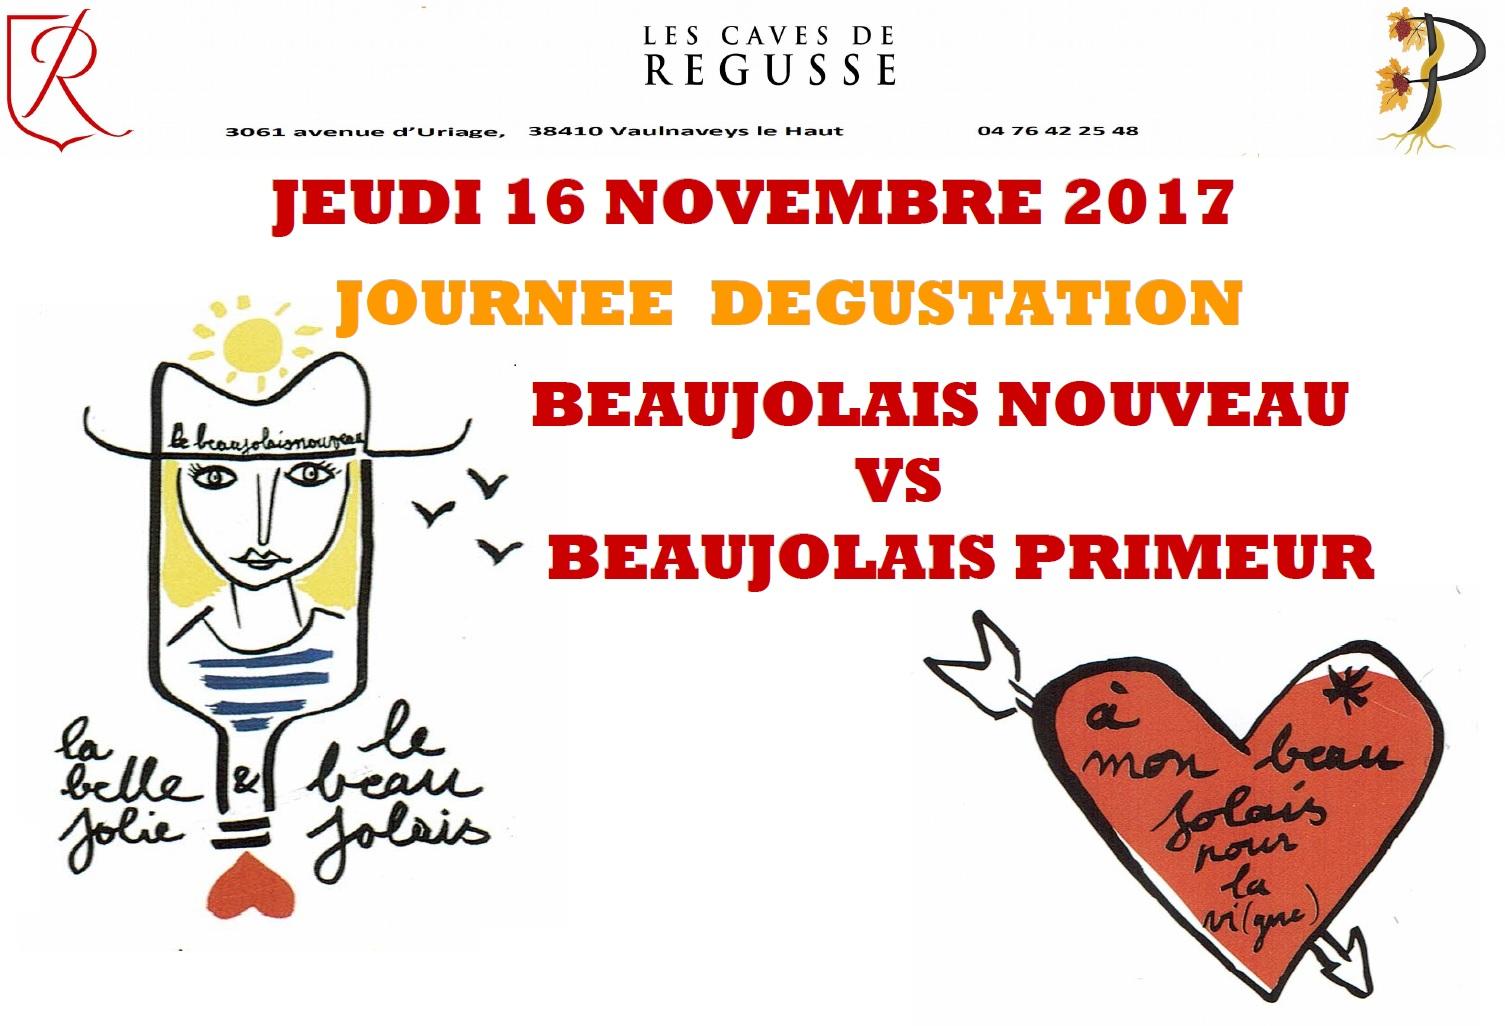 Beaujolais nouveau ! Jeudi 16 novembre 2017